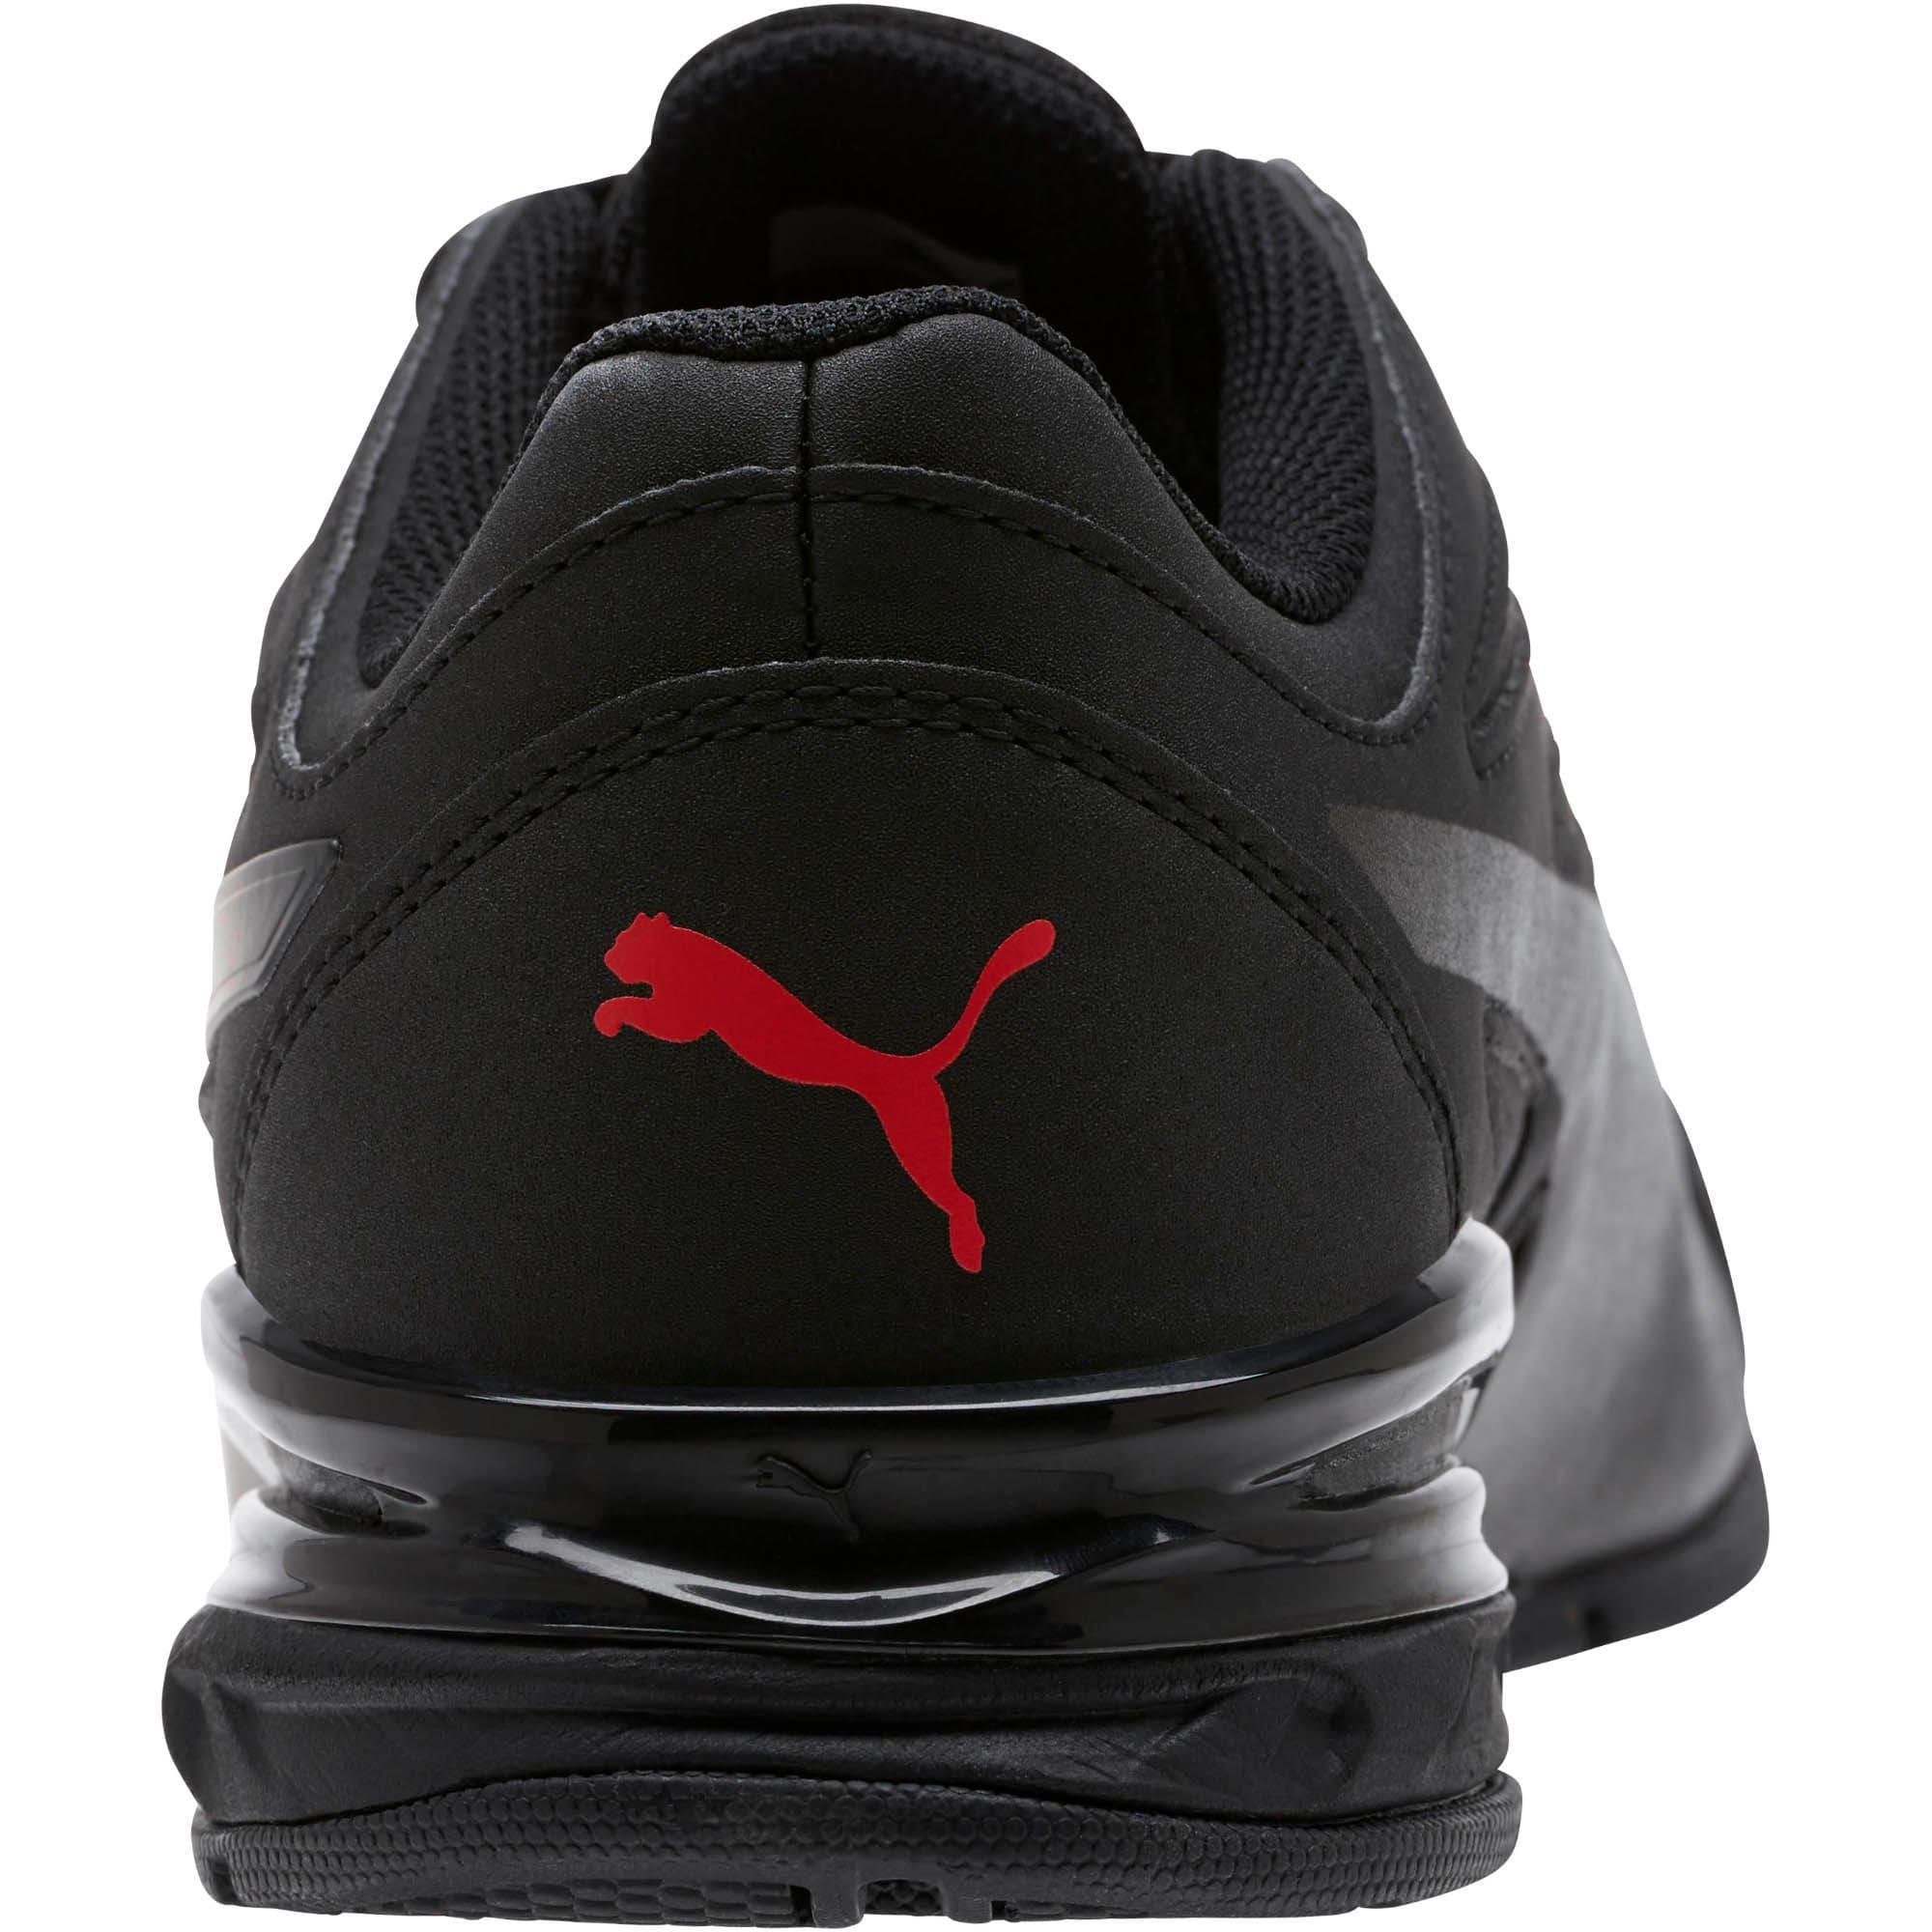 Thumbnail 4 of Tazon Modern SL FM Men's Sneakers, Puma Black-high risk red, medium